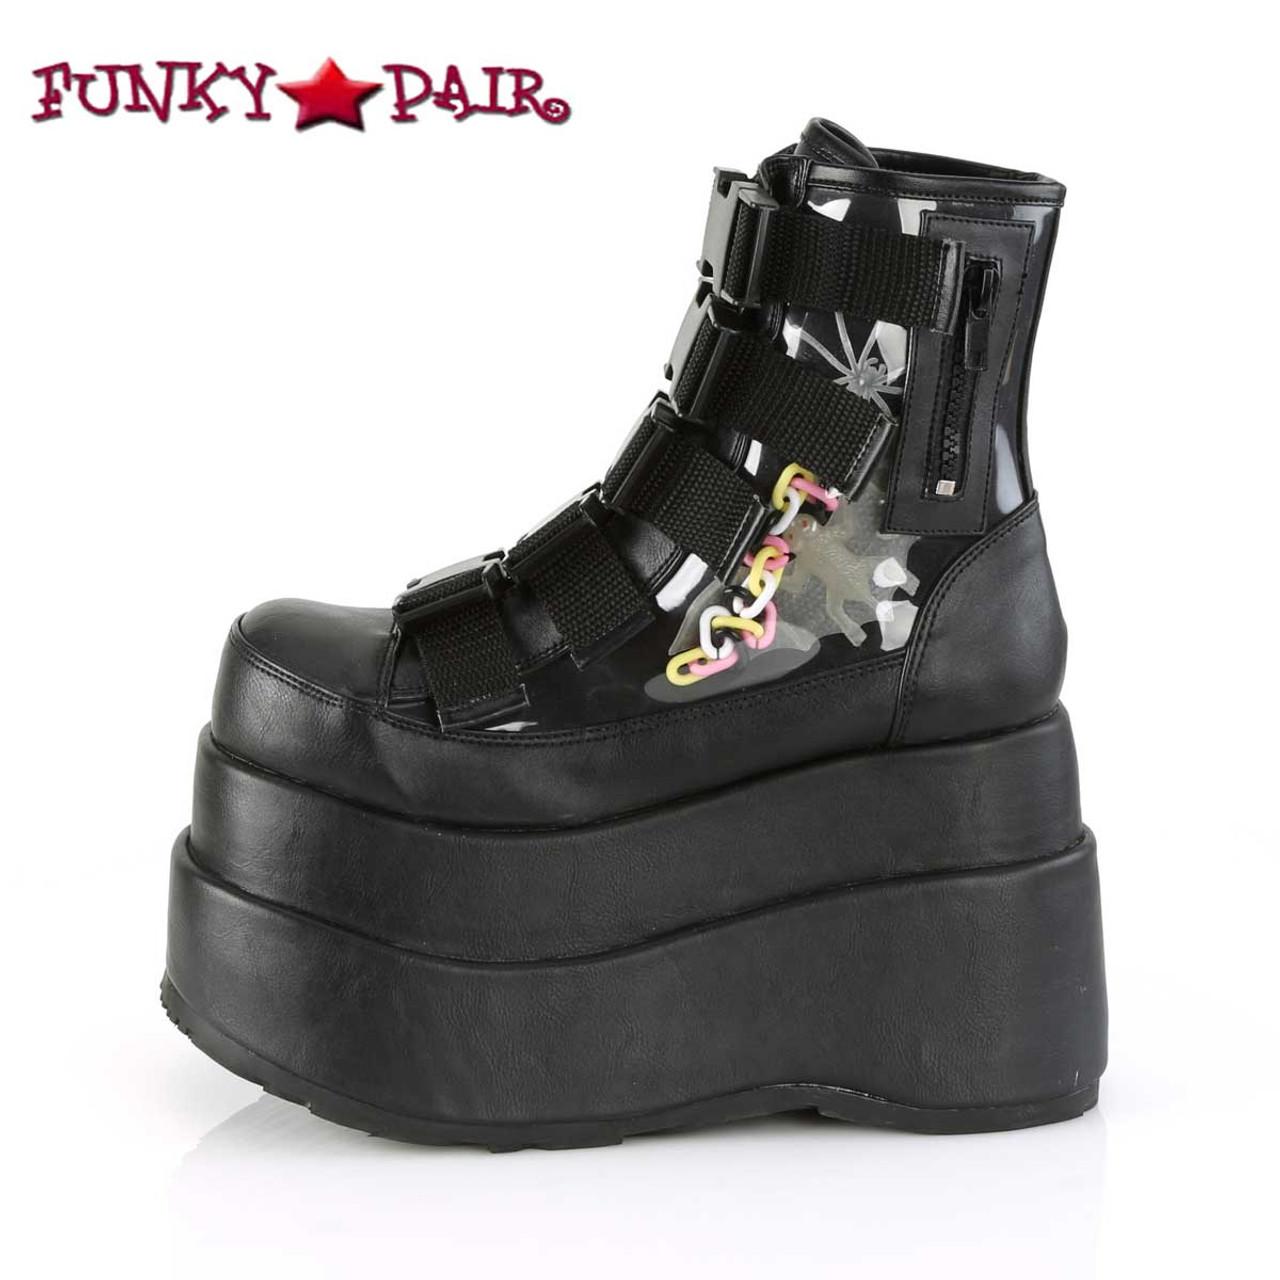 906aff53ae8 Demonia Bear-105, Spider Platform Ankle Boots